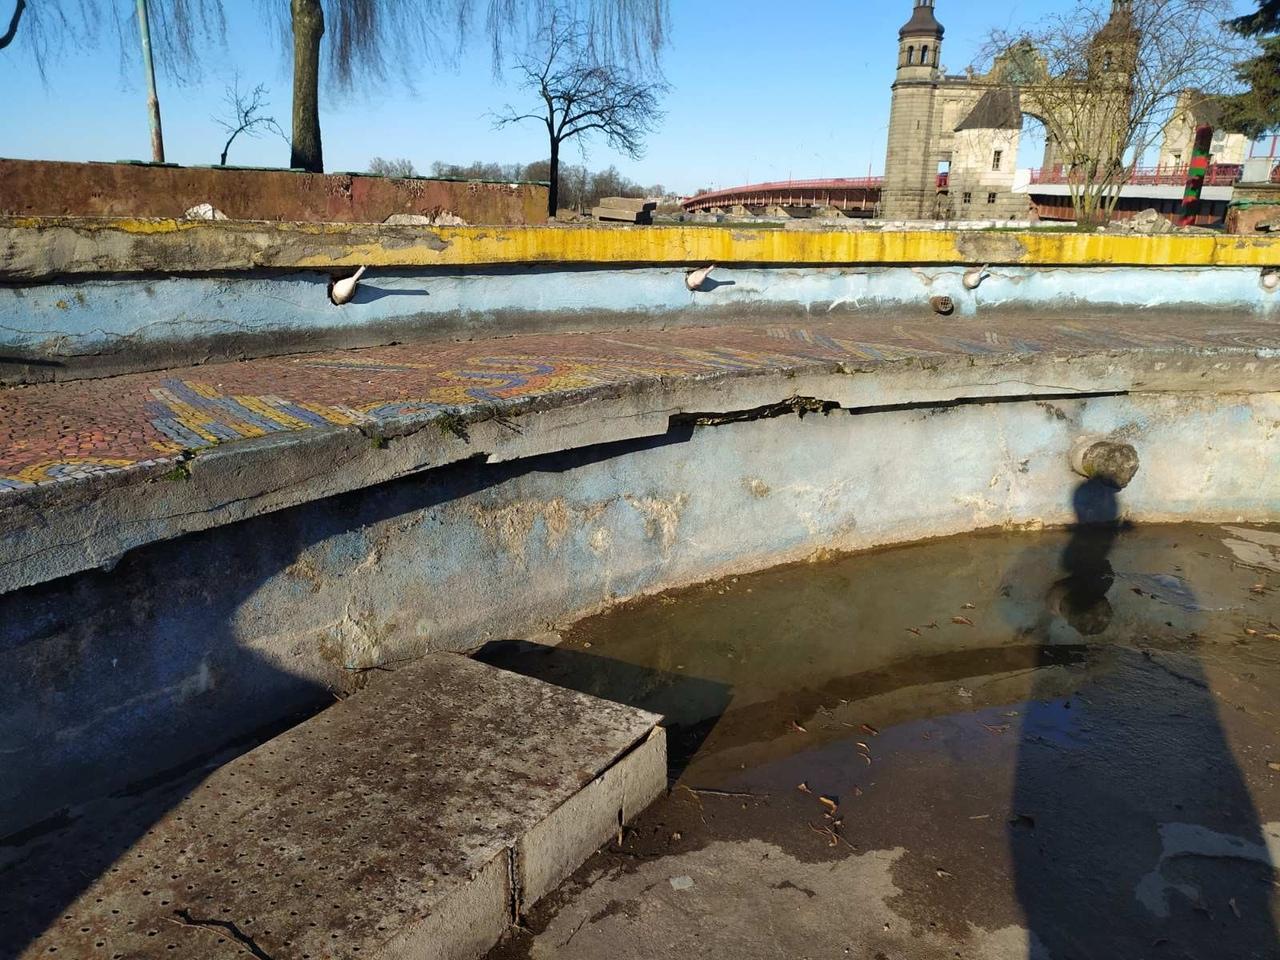 Сохранят ли мозаику на фонтане возле моста в Советске?